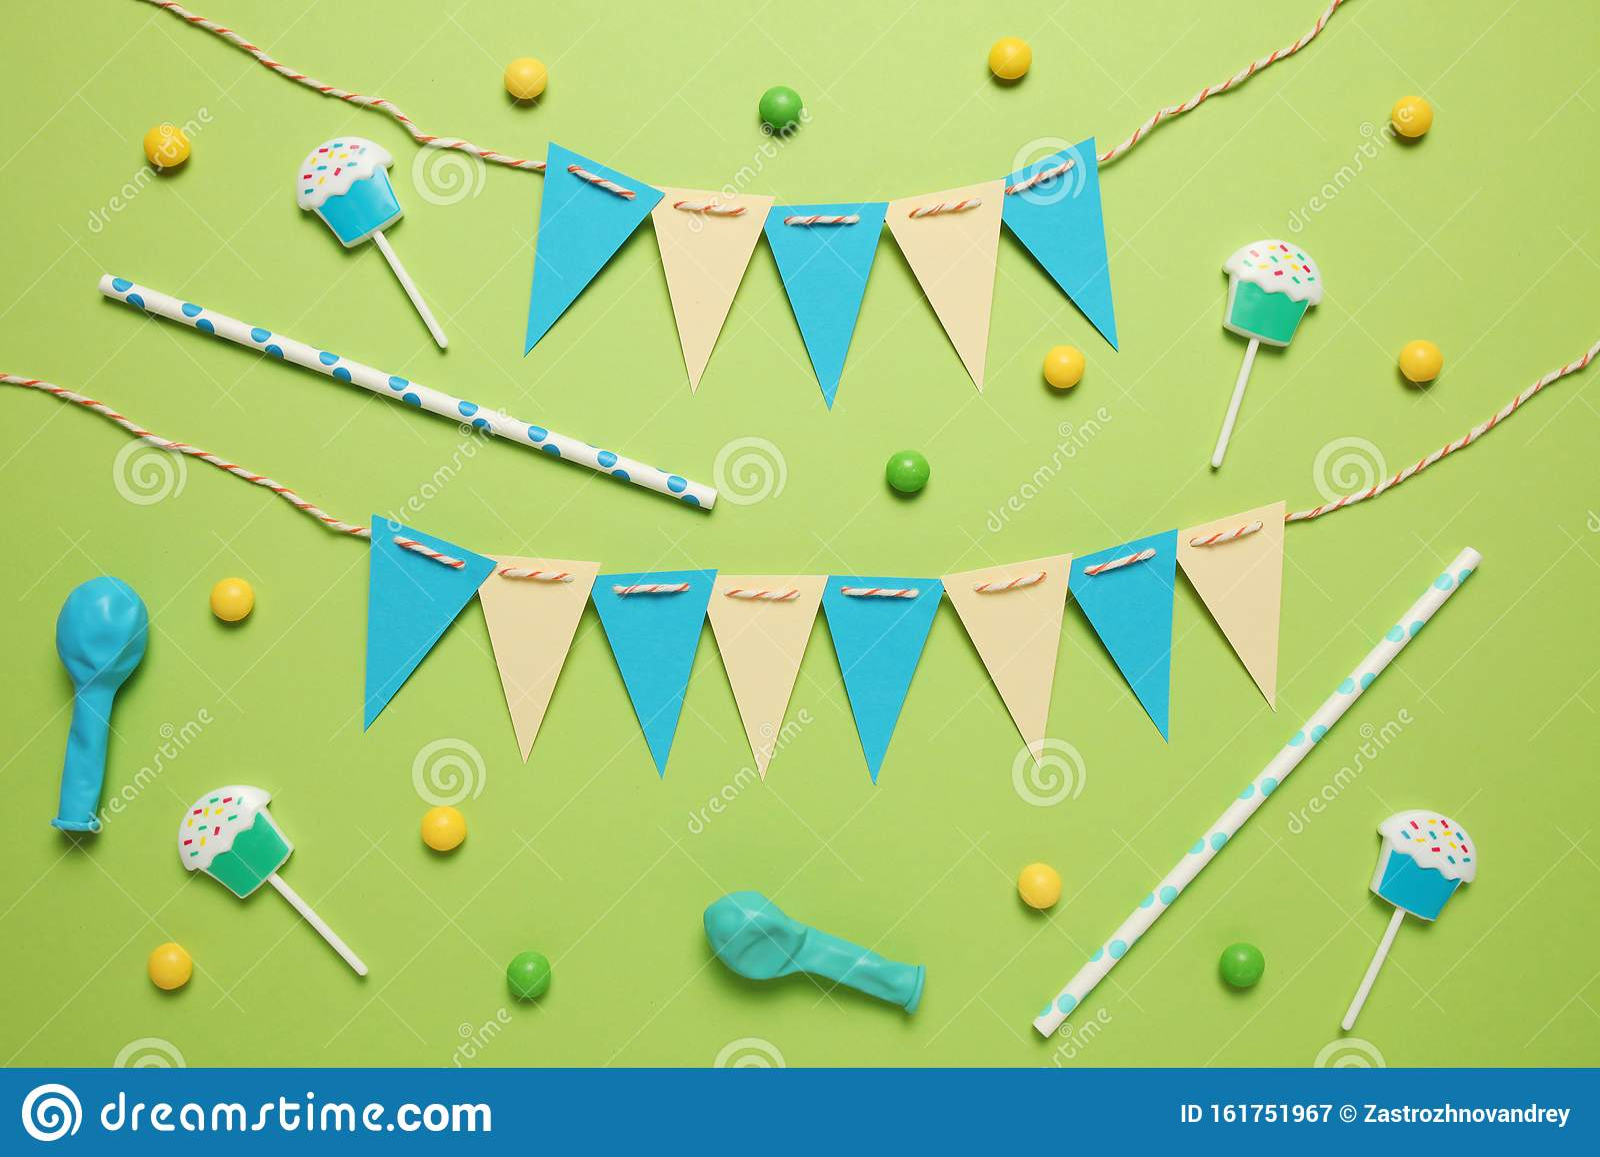 Happy birthday party items, flat lay pattern